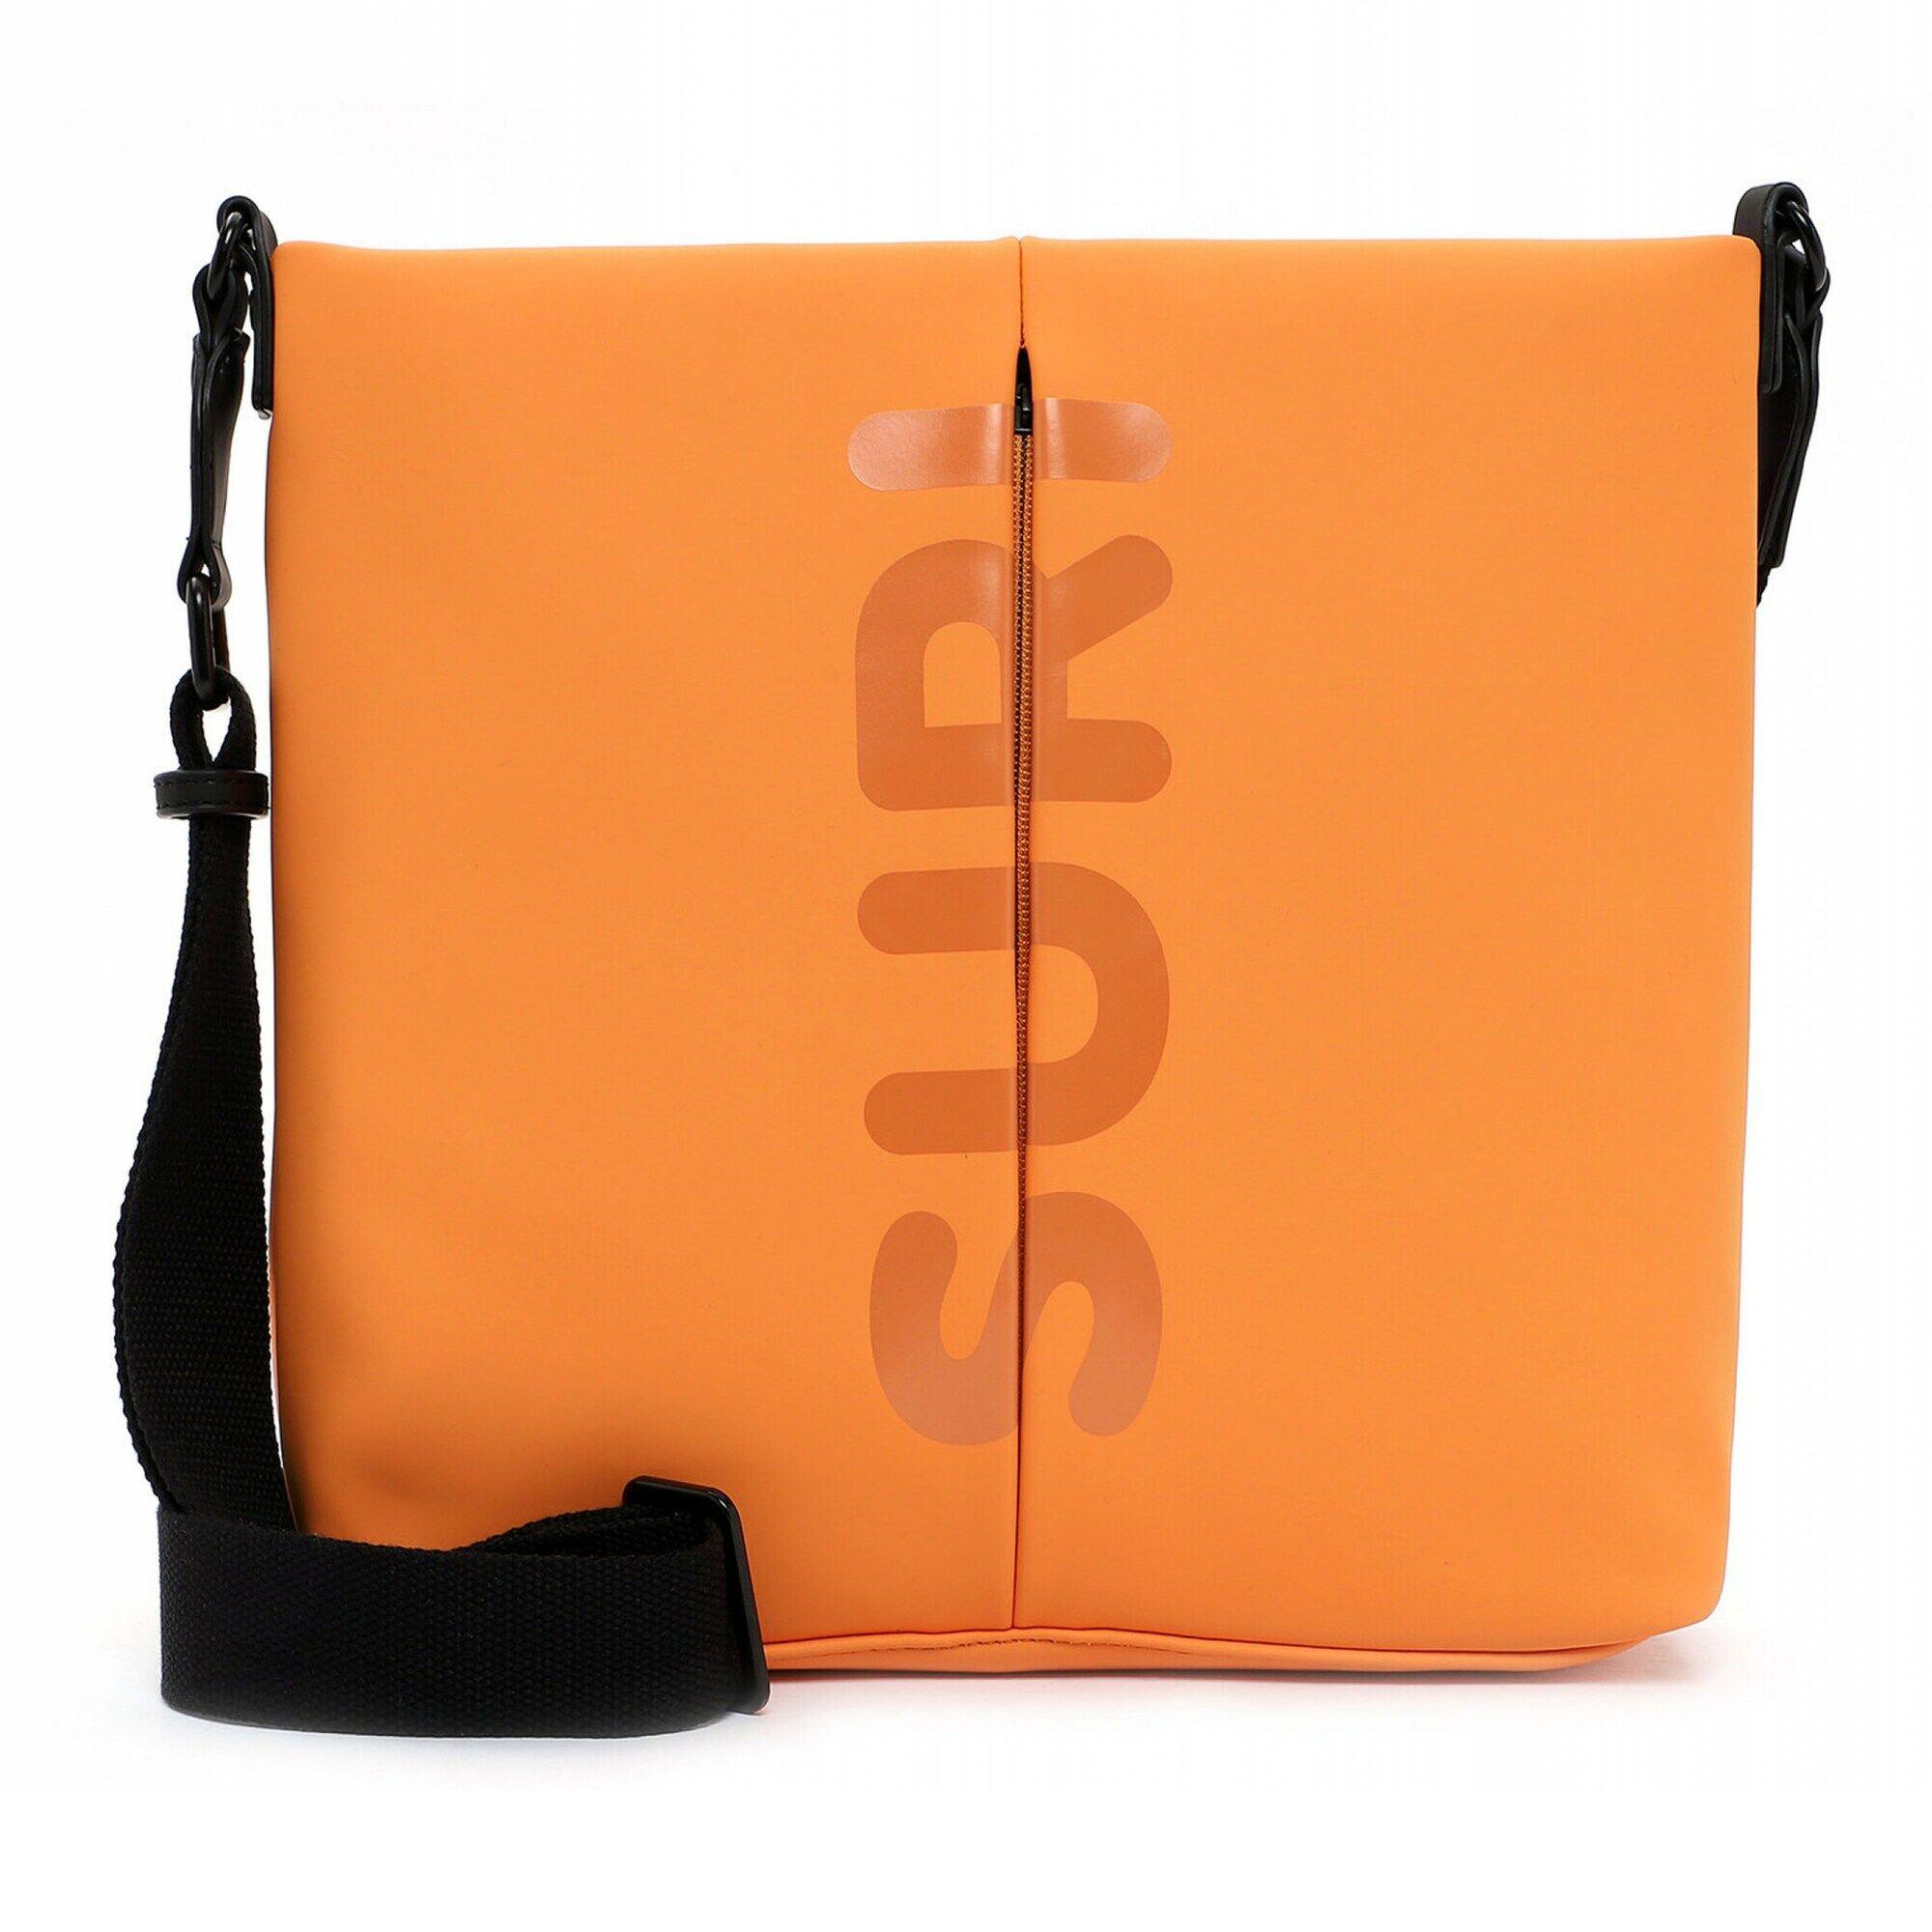 Suri Frey Sac à bandoulière 'Sady'  - Orange - Taille: One Size - female